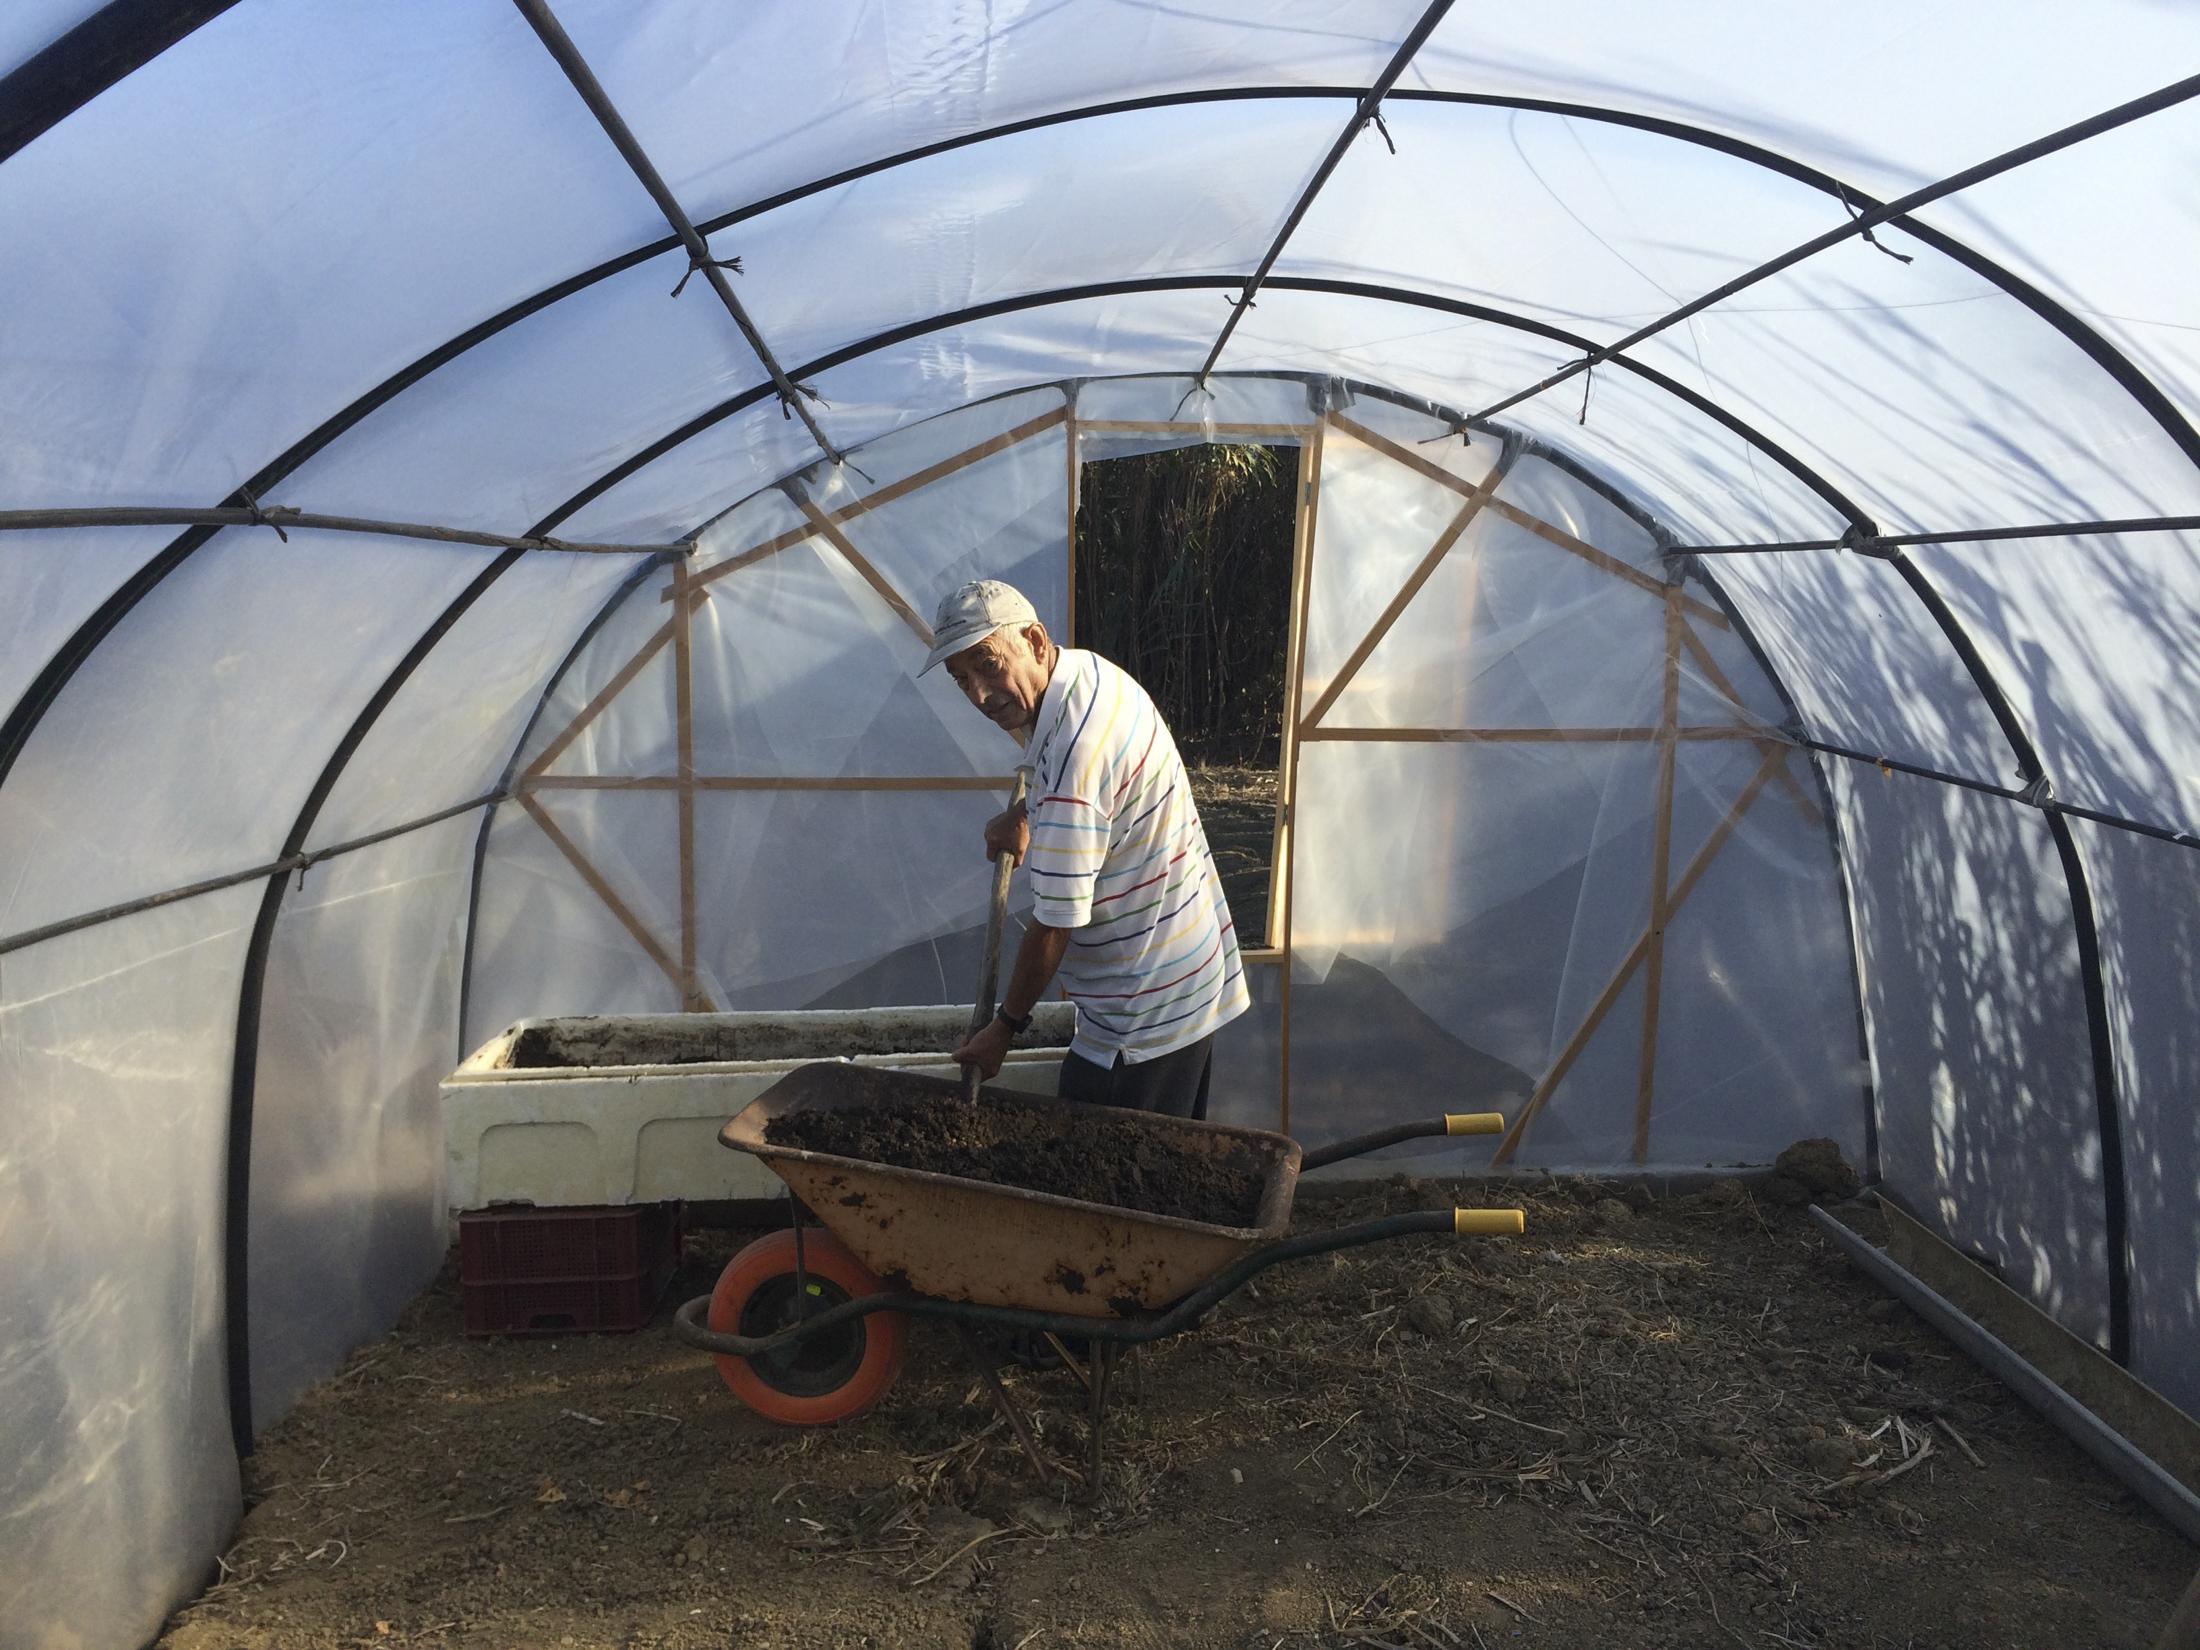 Francisco in the greenhouse Tarifa